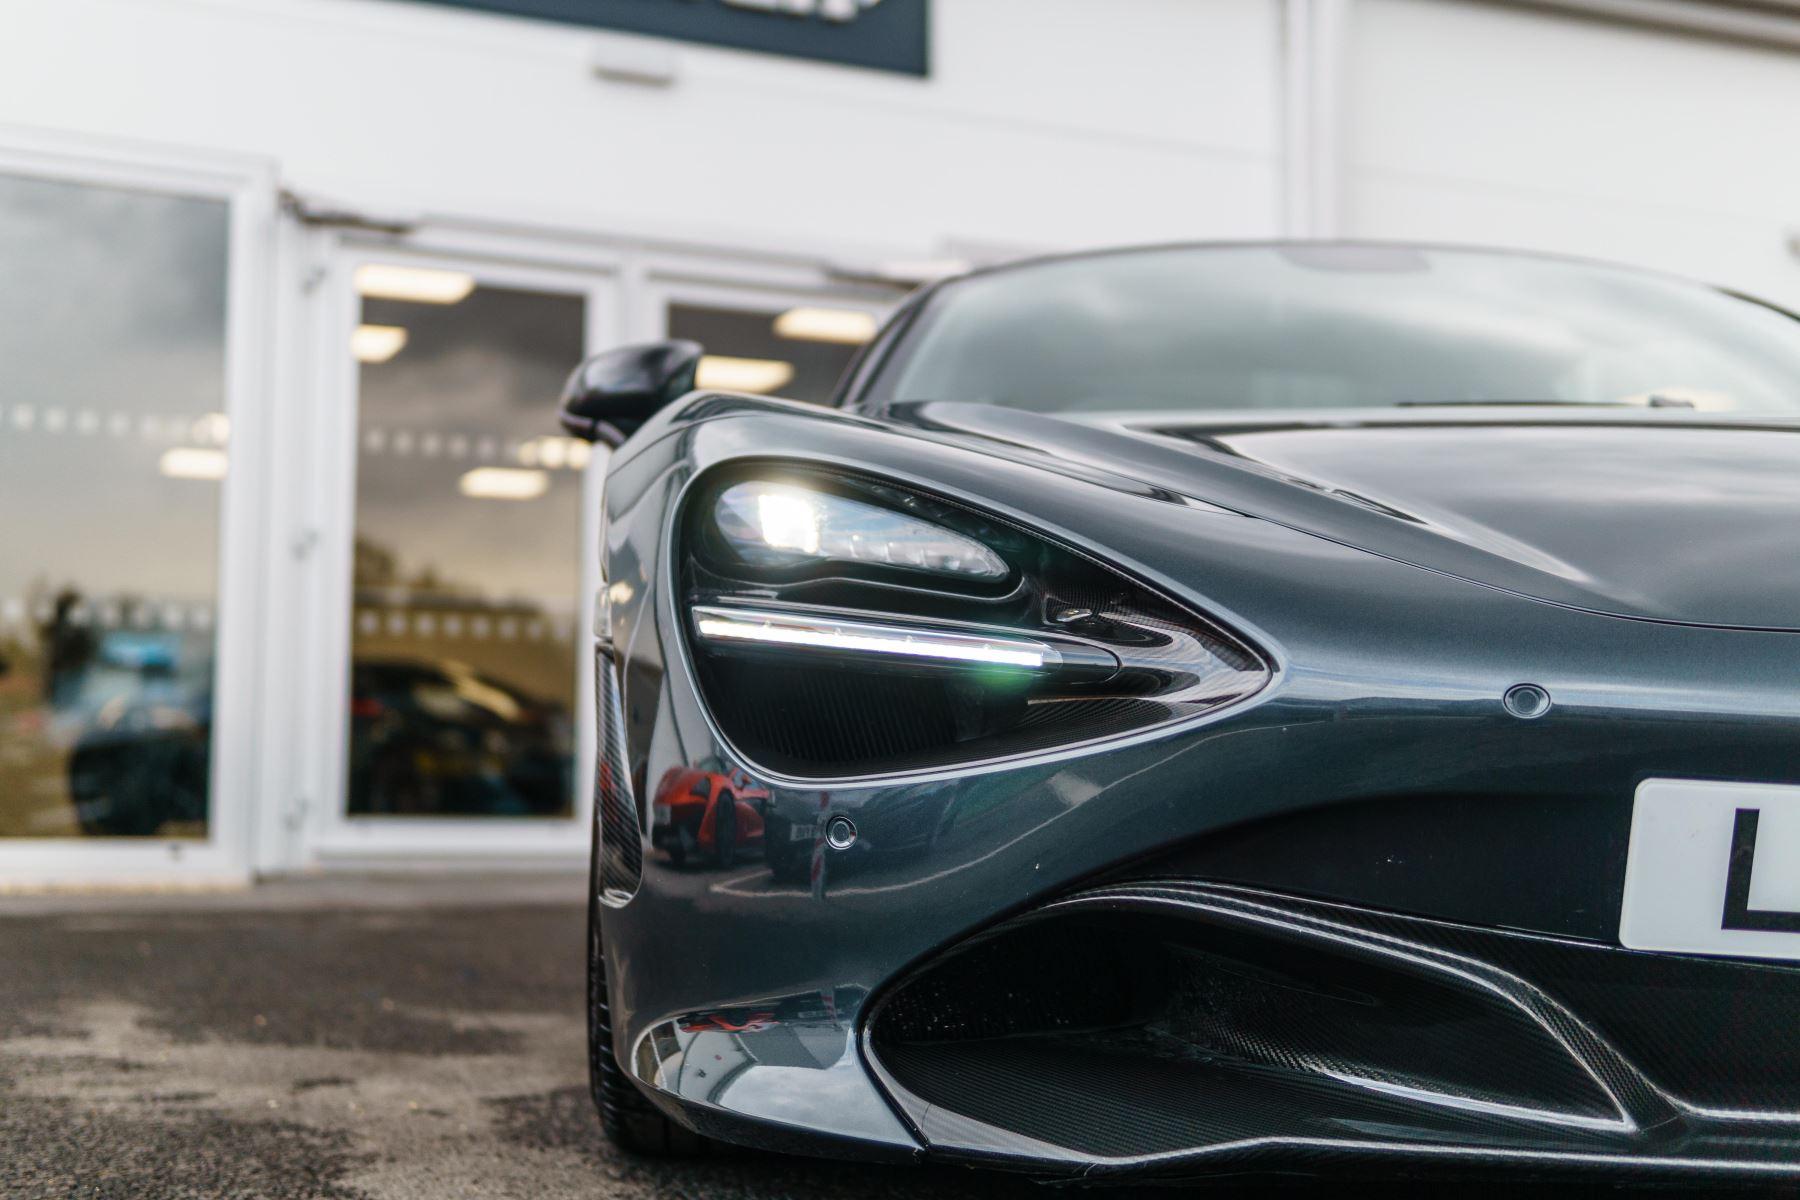 McLaren 720S Performance V8 Coupe SSG image 9